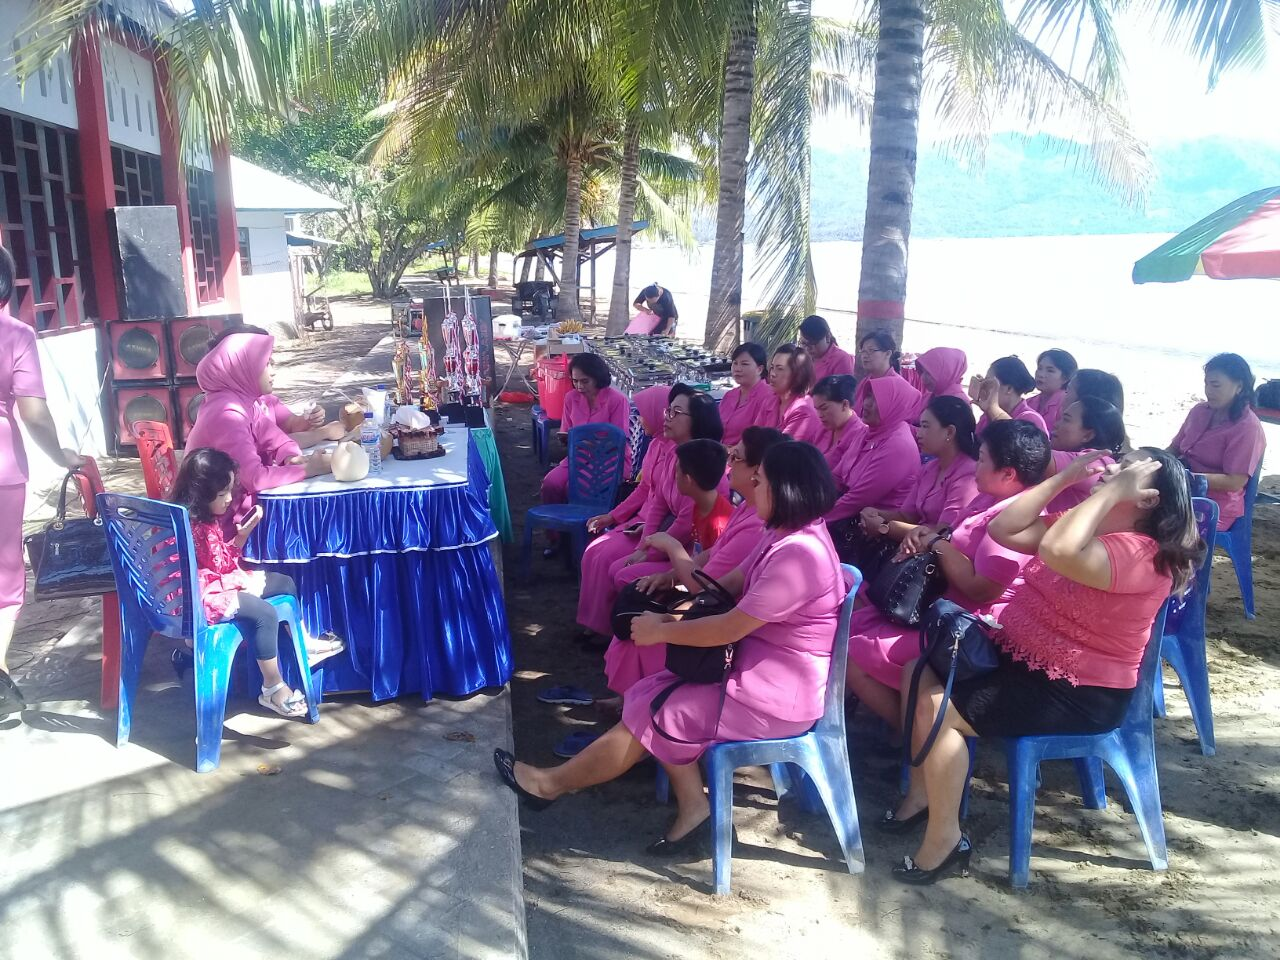 Tribratanewsminsel Bhayangkari Cabang Minsel Gelar Pertemuan Rutin Pagi Tadi Sabtu